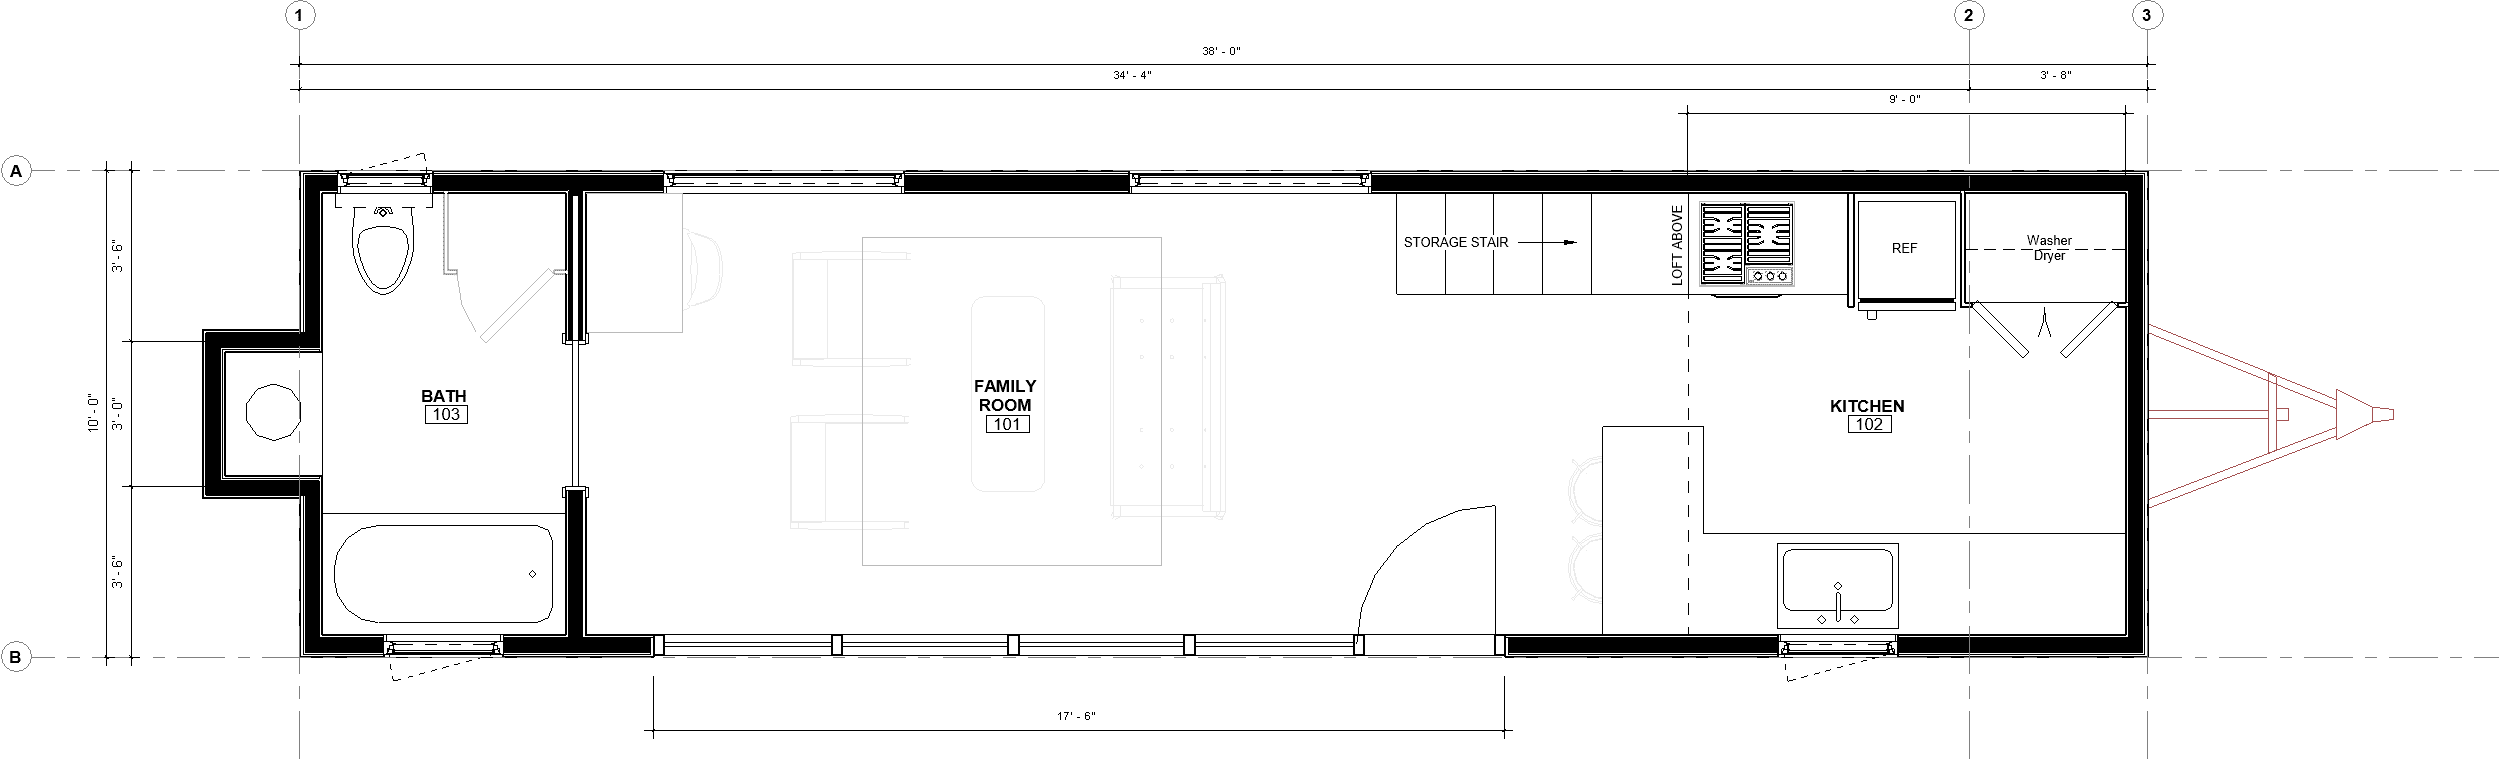 38ft Loft Brooks floorplan with dimensions